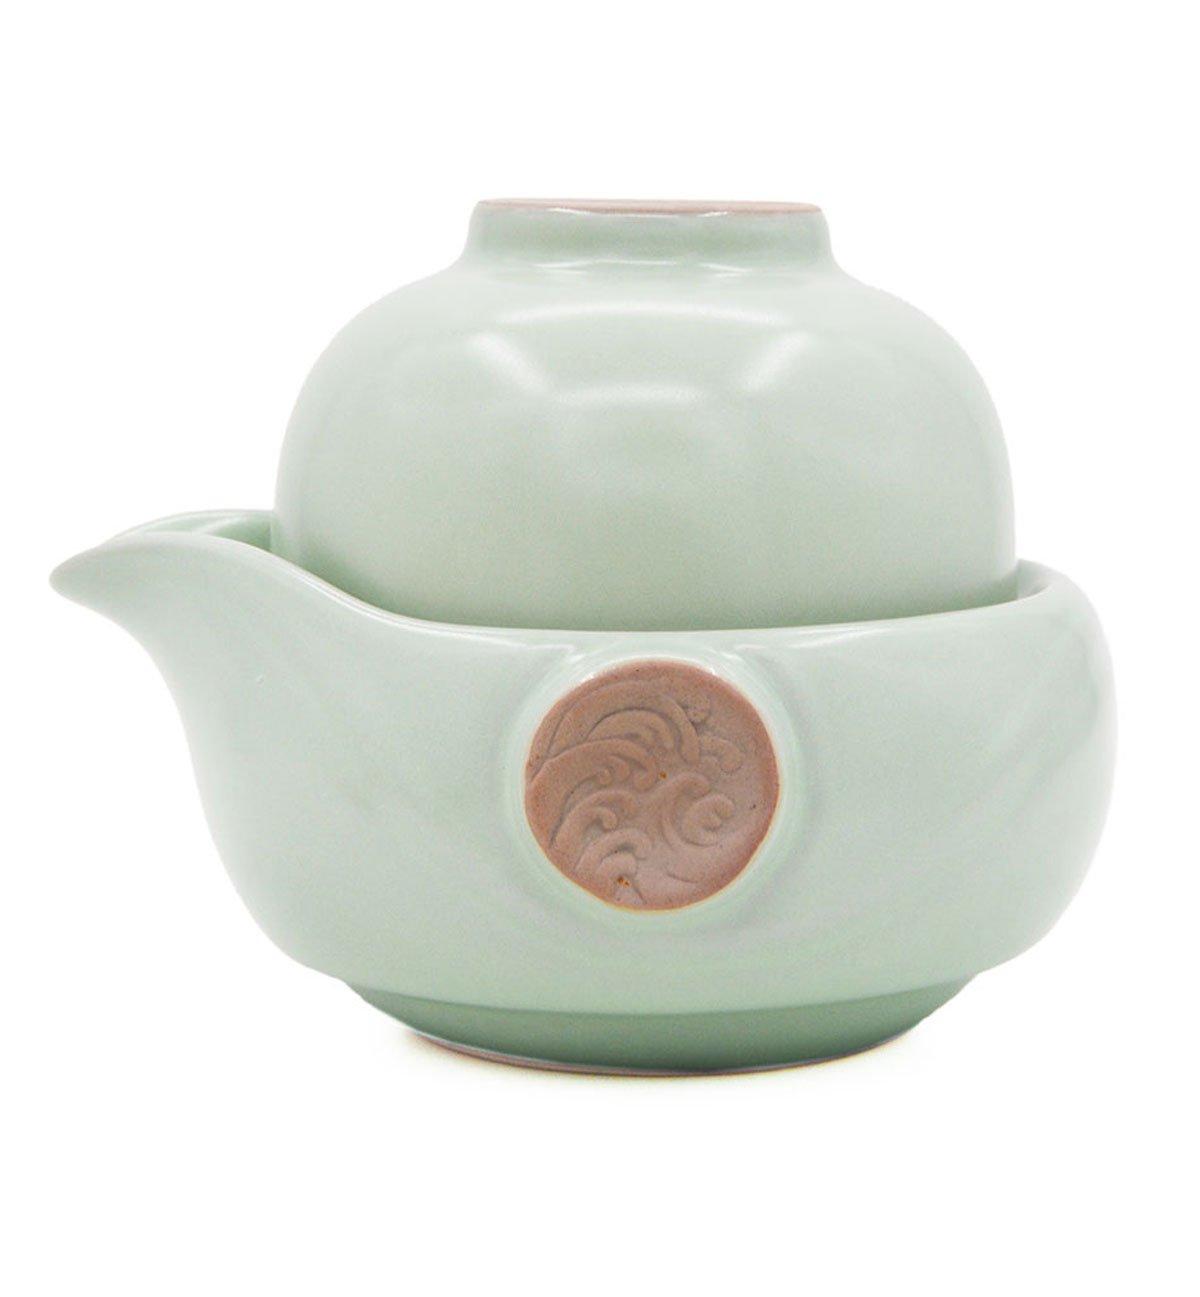 Vegali Celadon Pumpkin-Style Portable Gongfu Tea Set -100% Handmade Chinese/Japanese Vintage Gongfu Teaset - Porcelain Teapot & Teacups (Celadon)